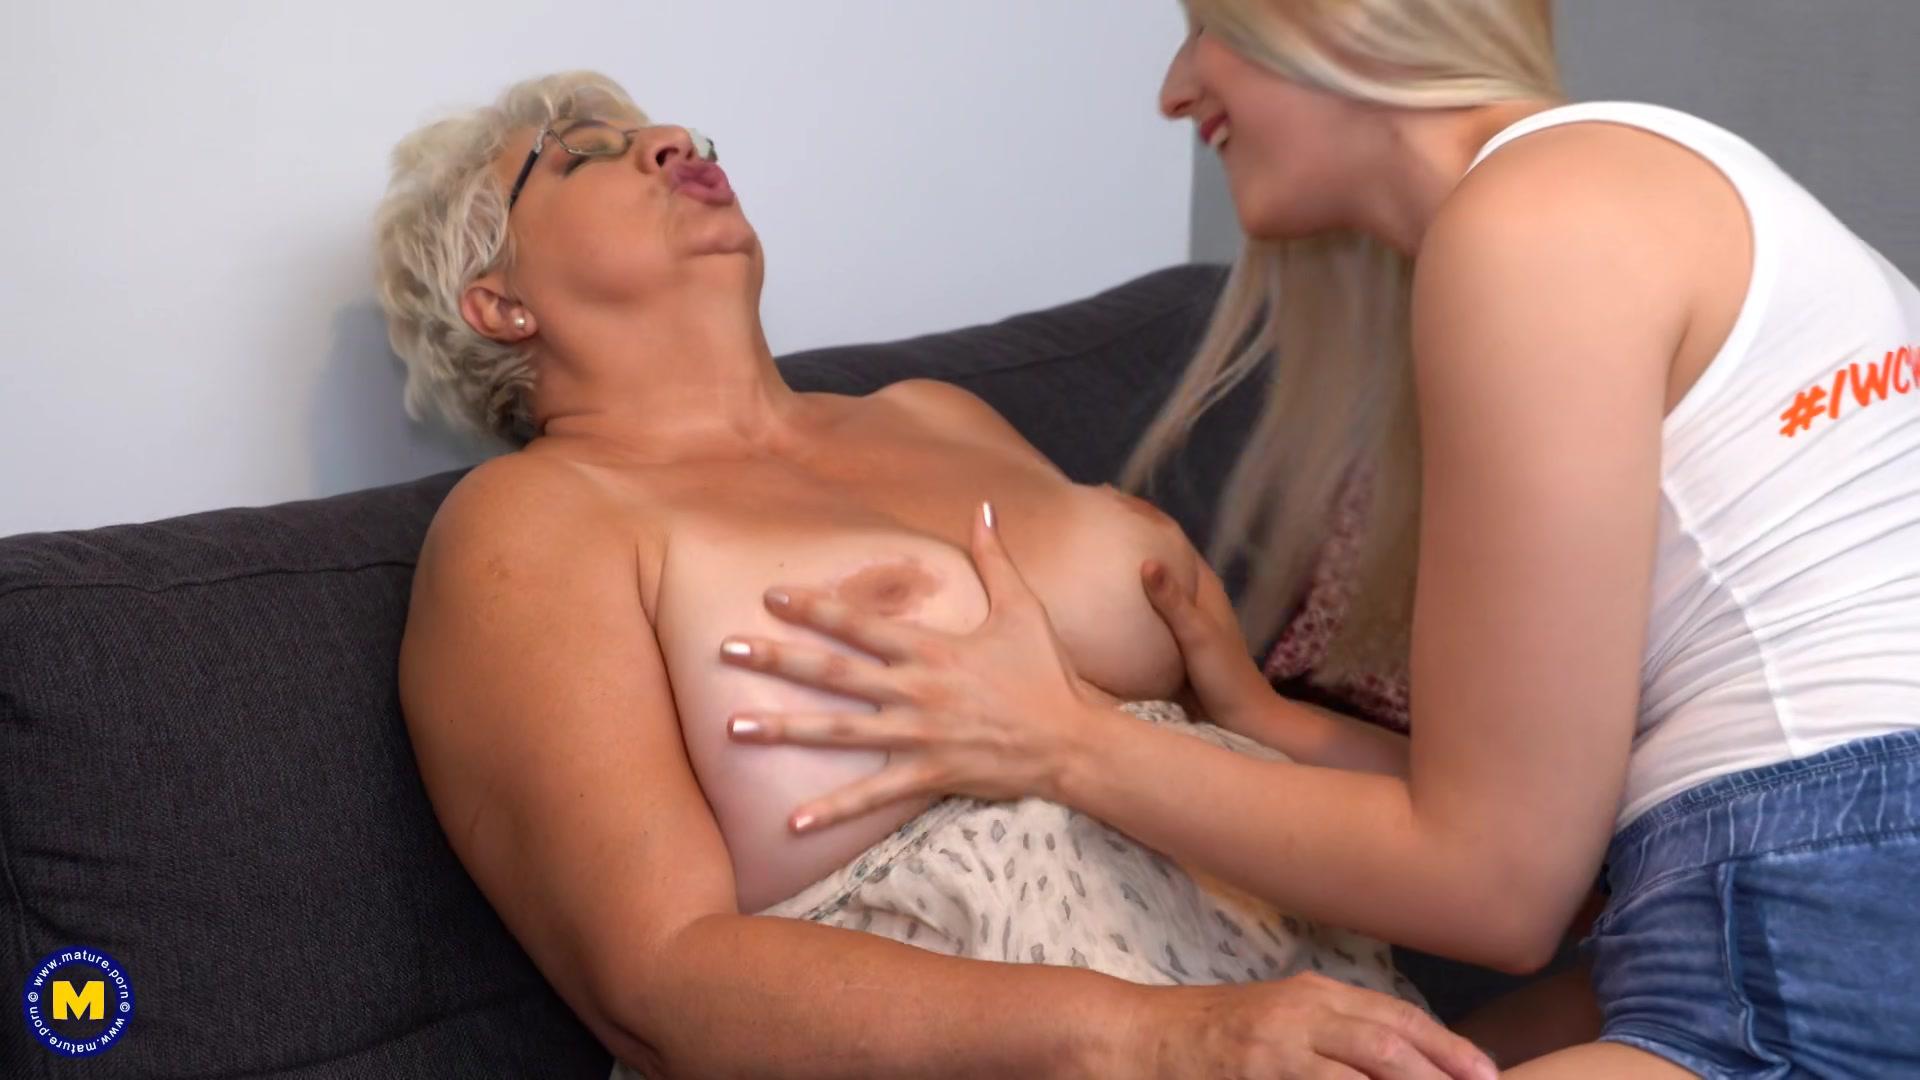 Abuelas Lesbian Porno chica y abuela lesbianas se divierten